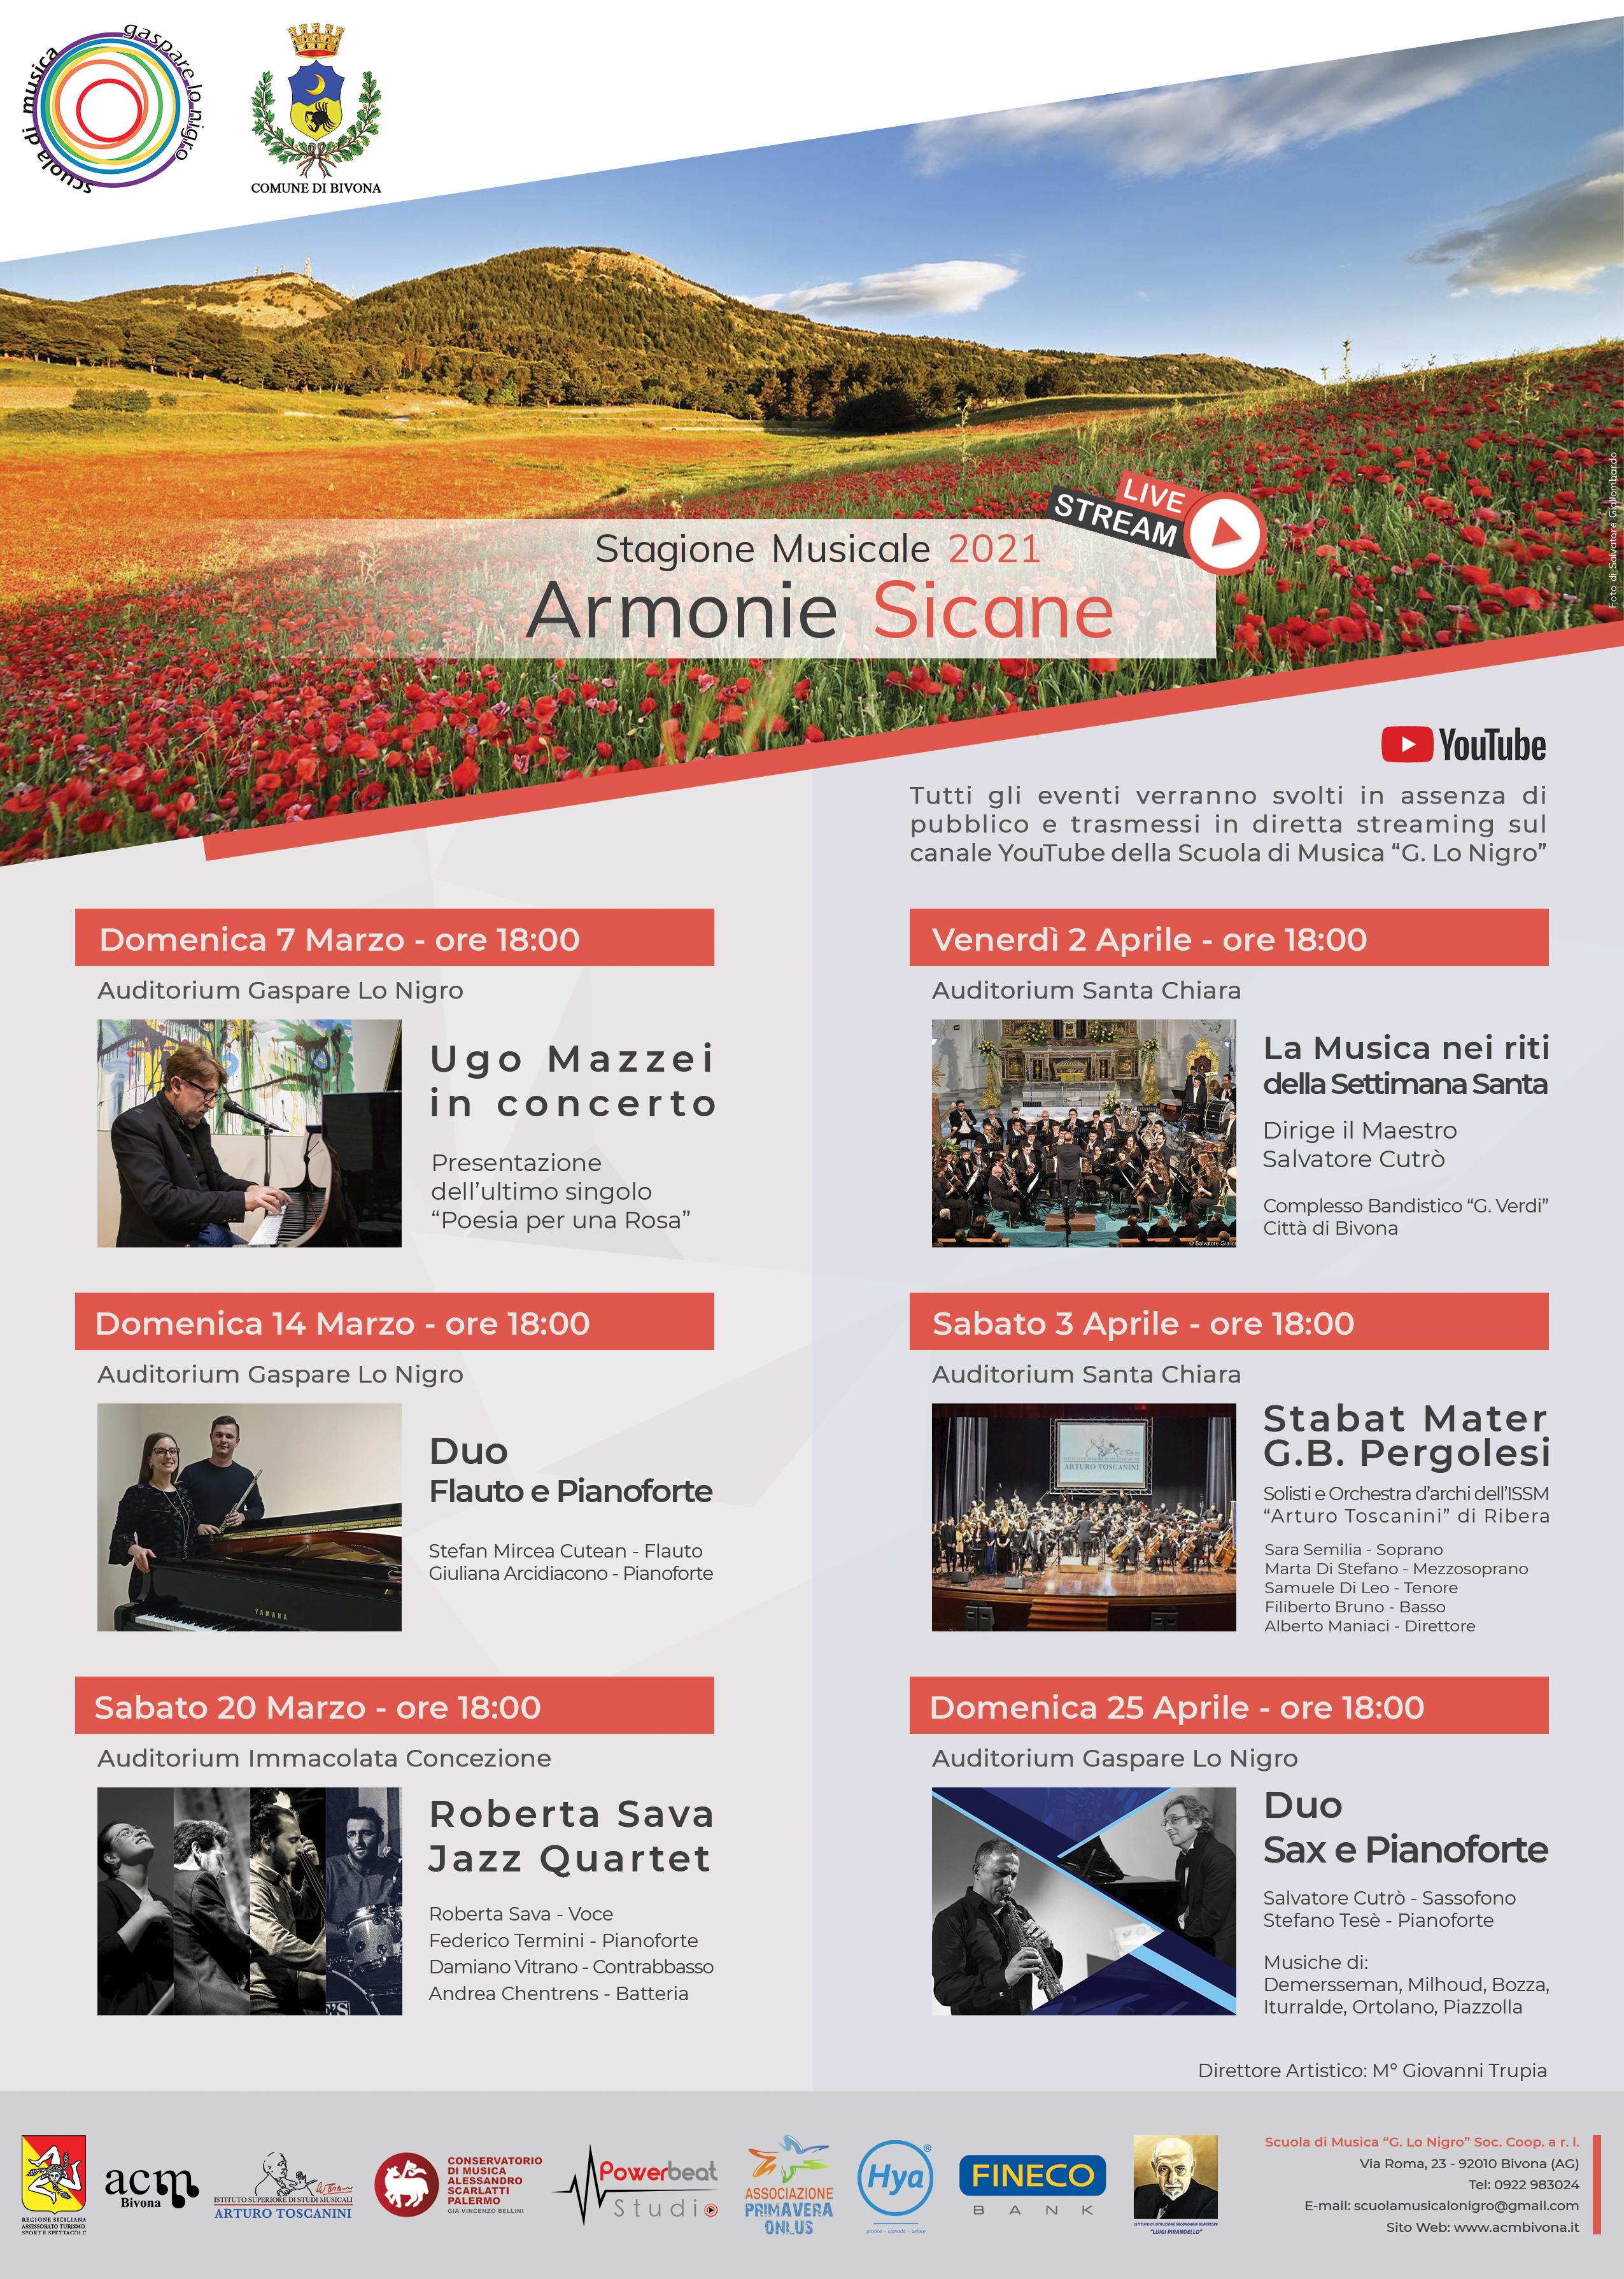 Armonie Sicane 2021 Streaming